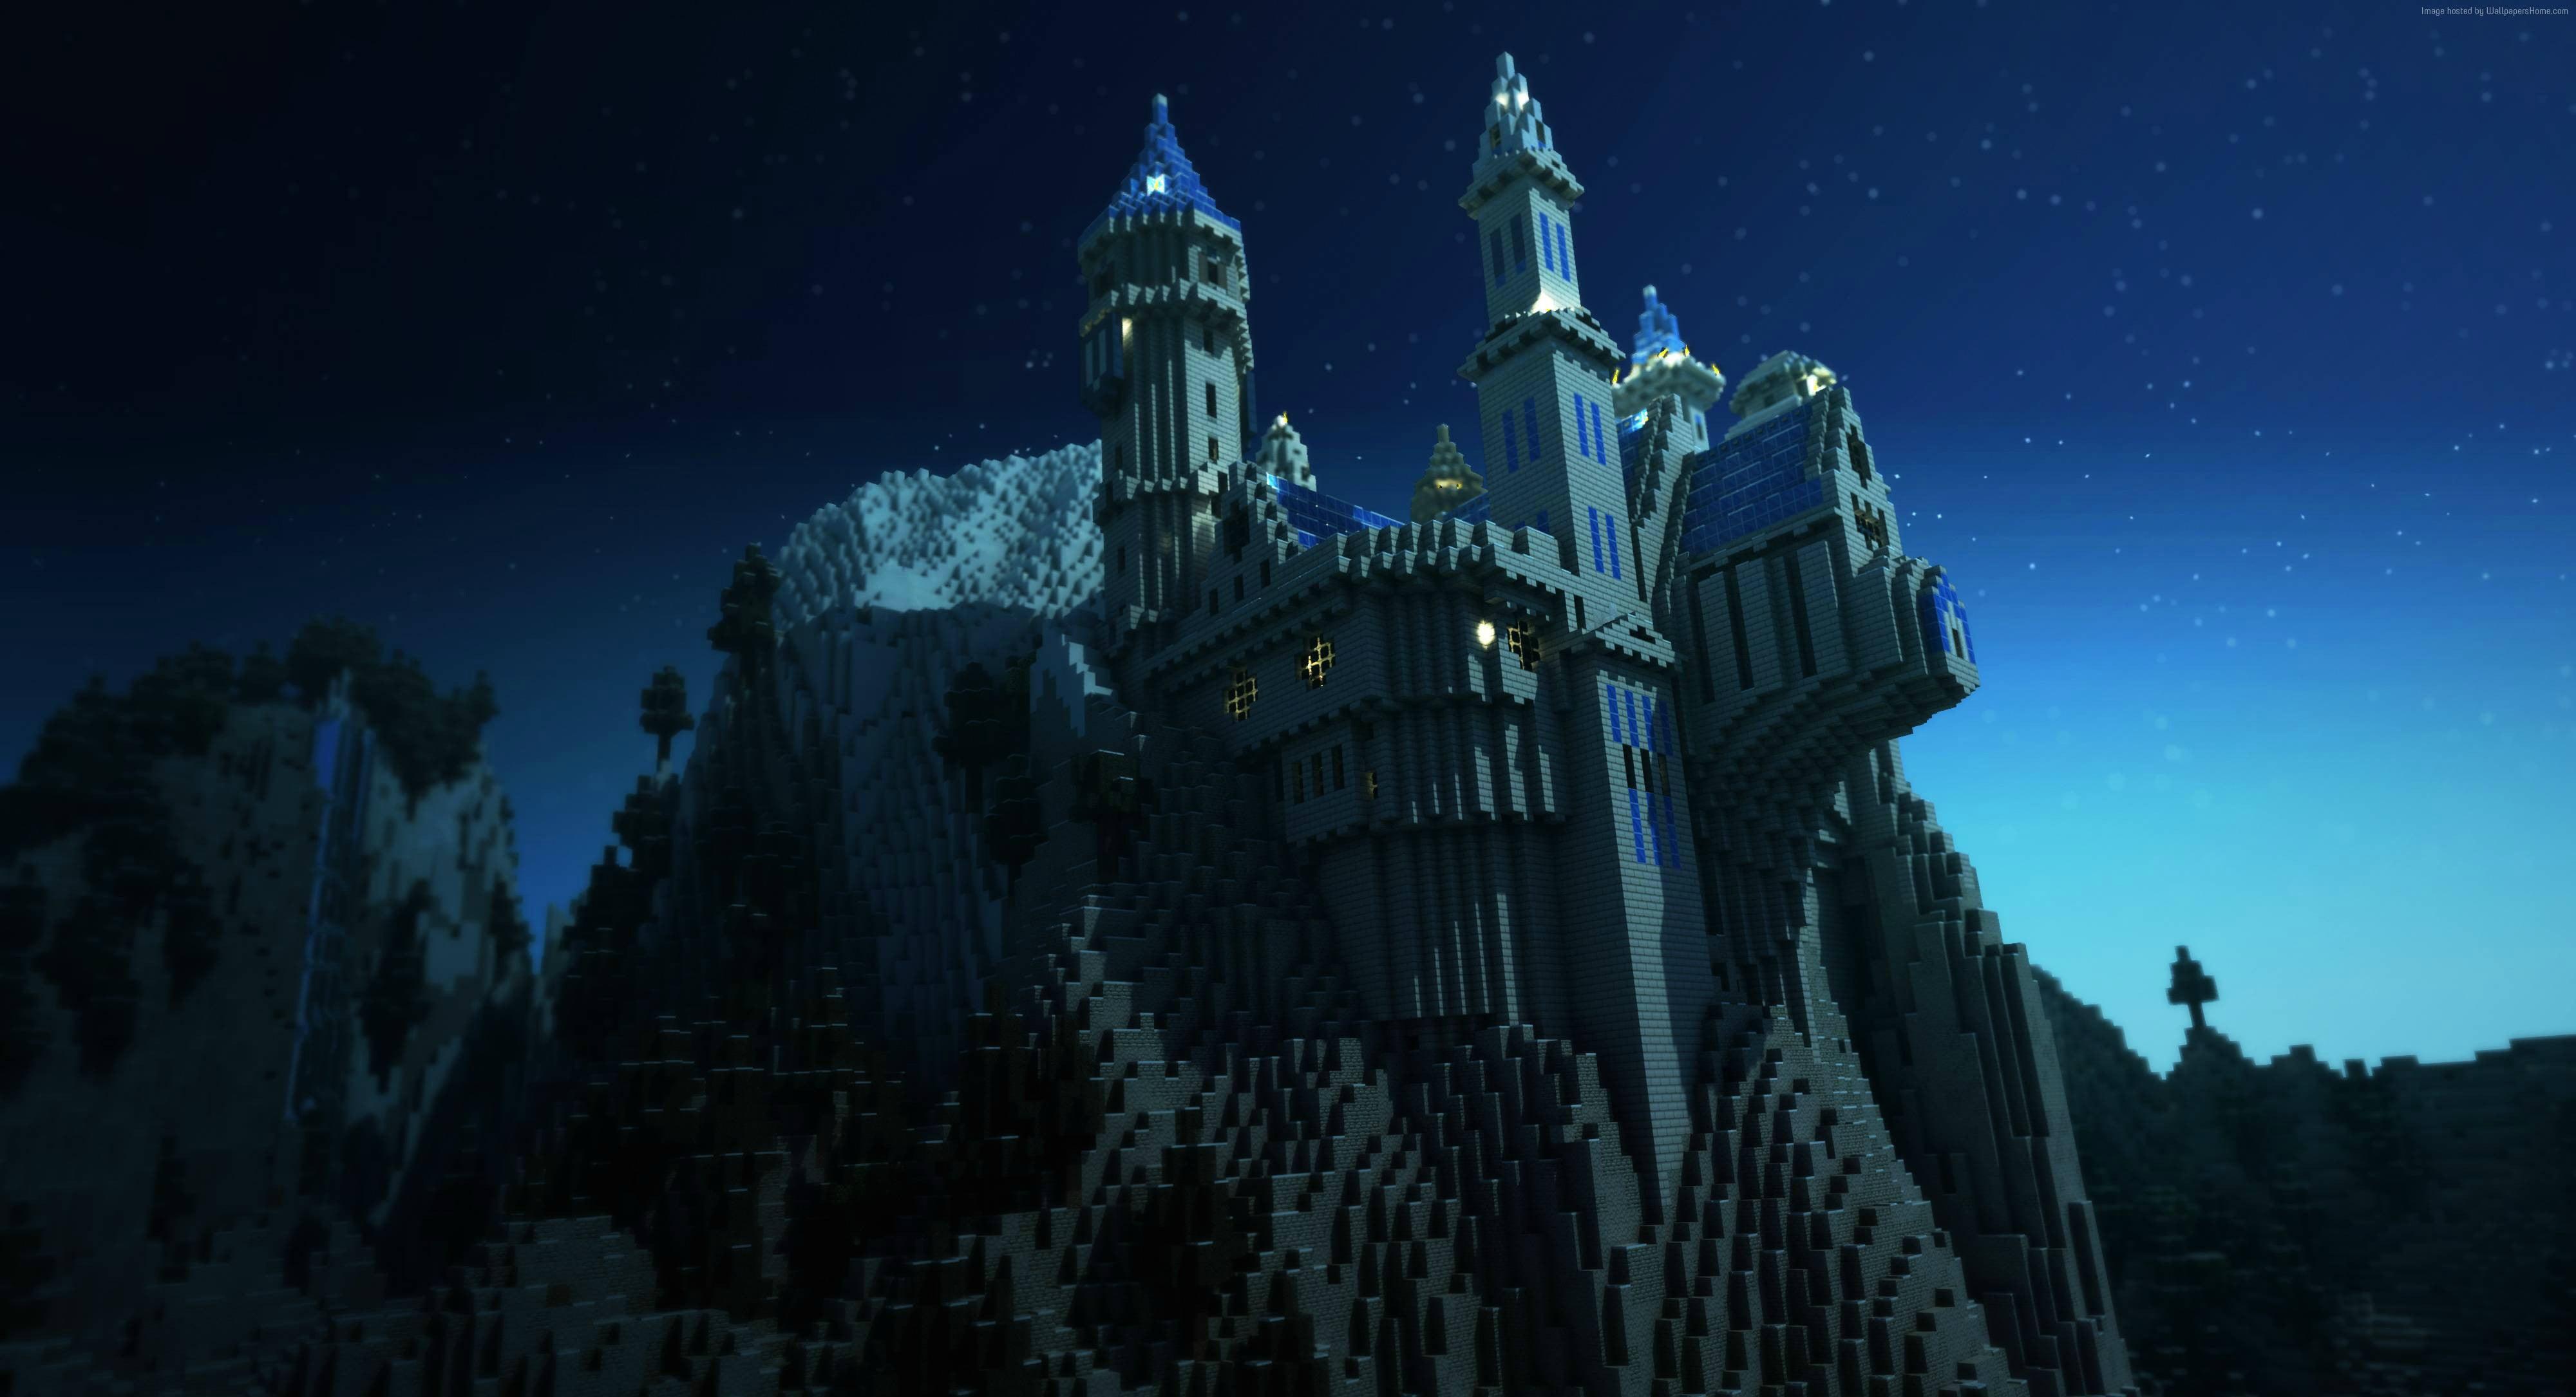 Minecraft castle photo HD wallpaper Wallpaper Flare 4000x2170